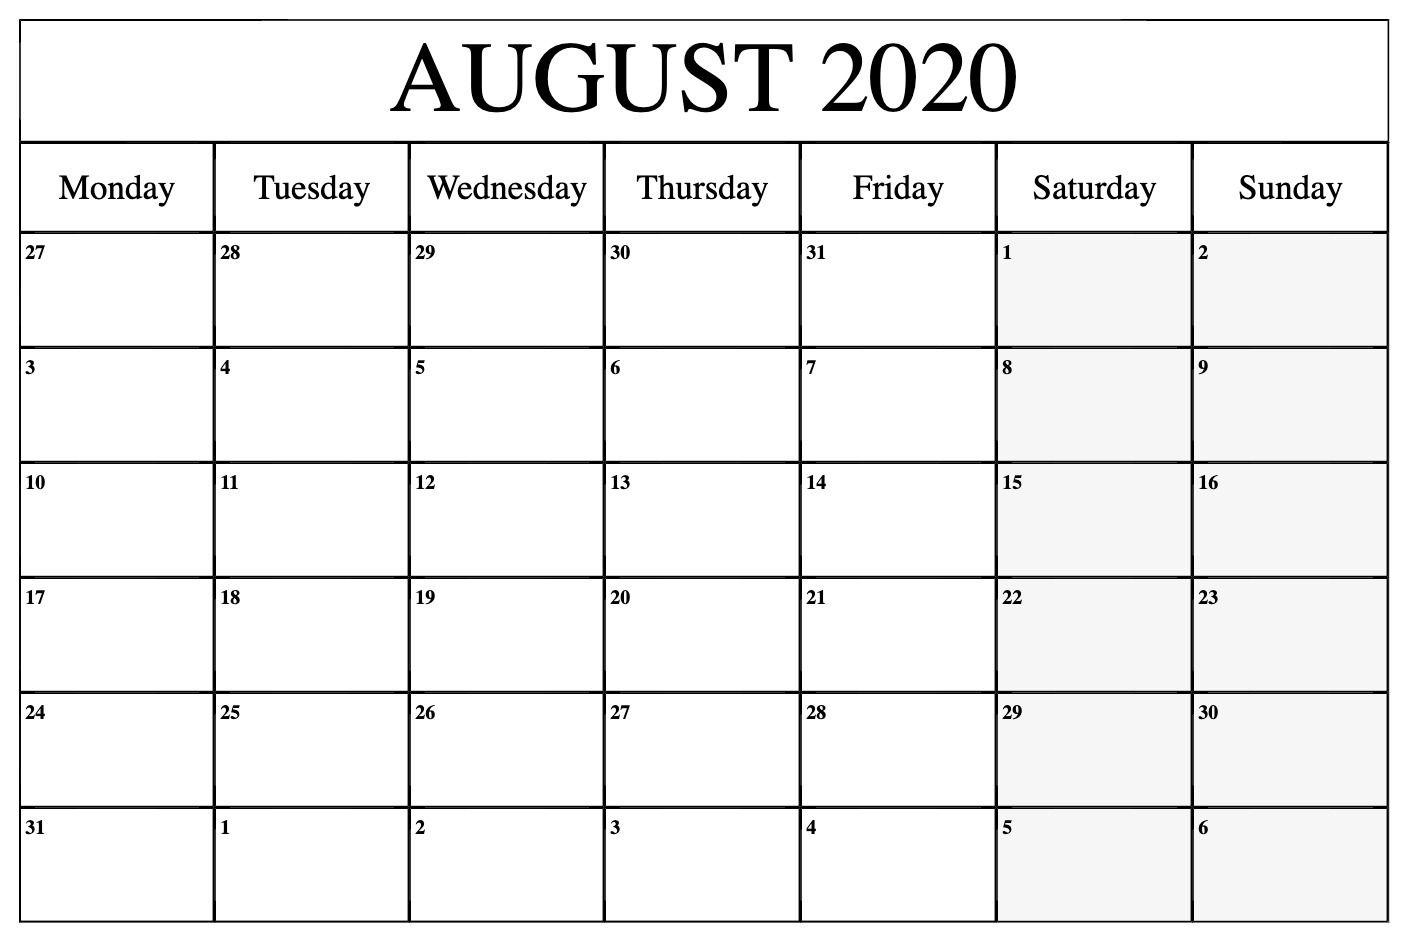 August 2020 Calendar Pdf Word Excel Printable Template 2020